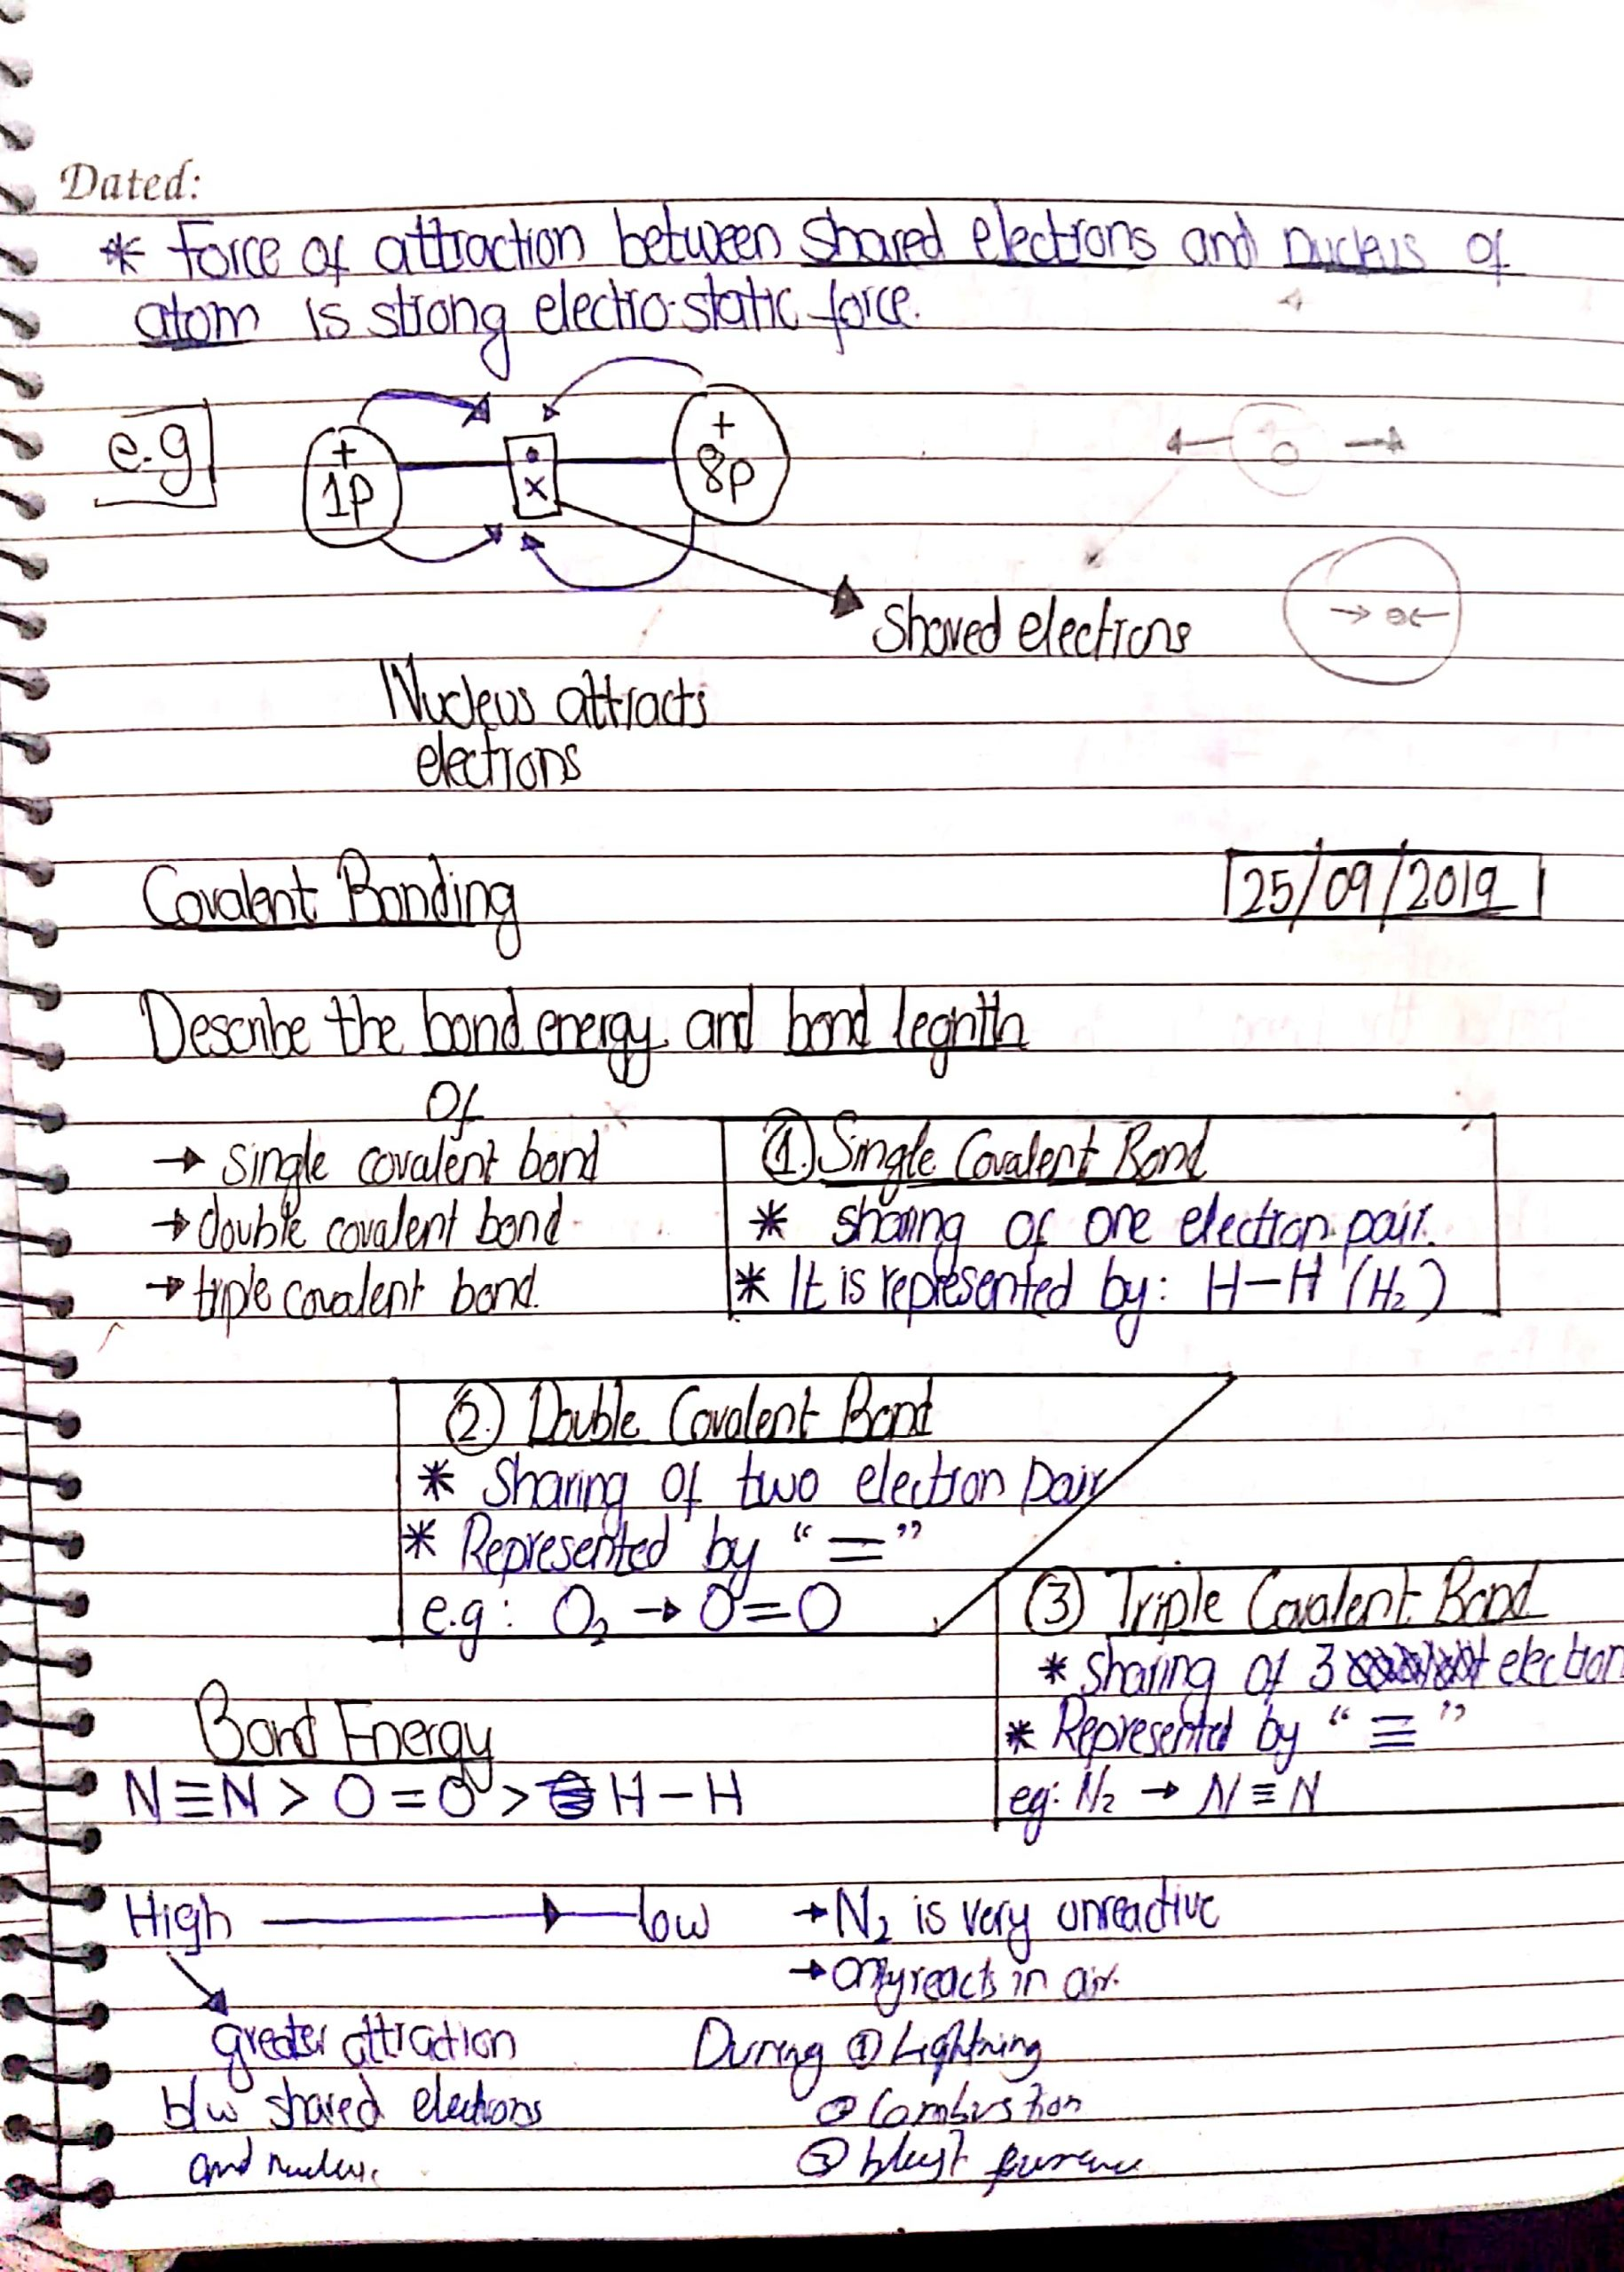 chemical bonding Sir Kashif_8